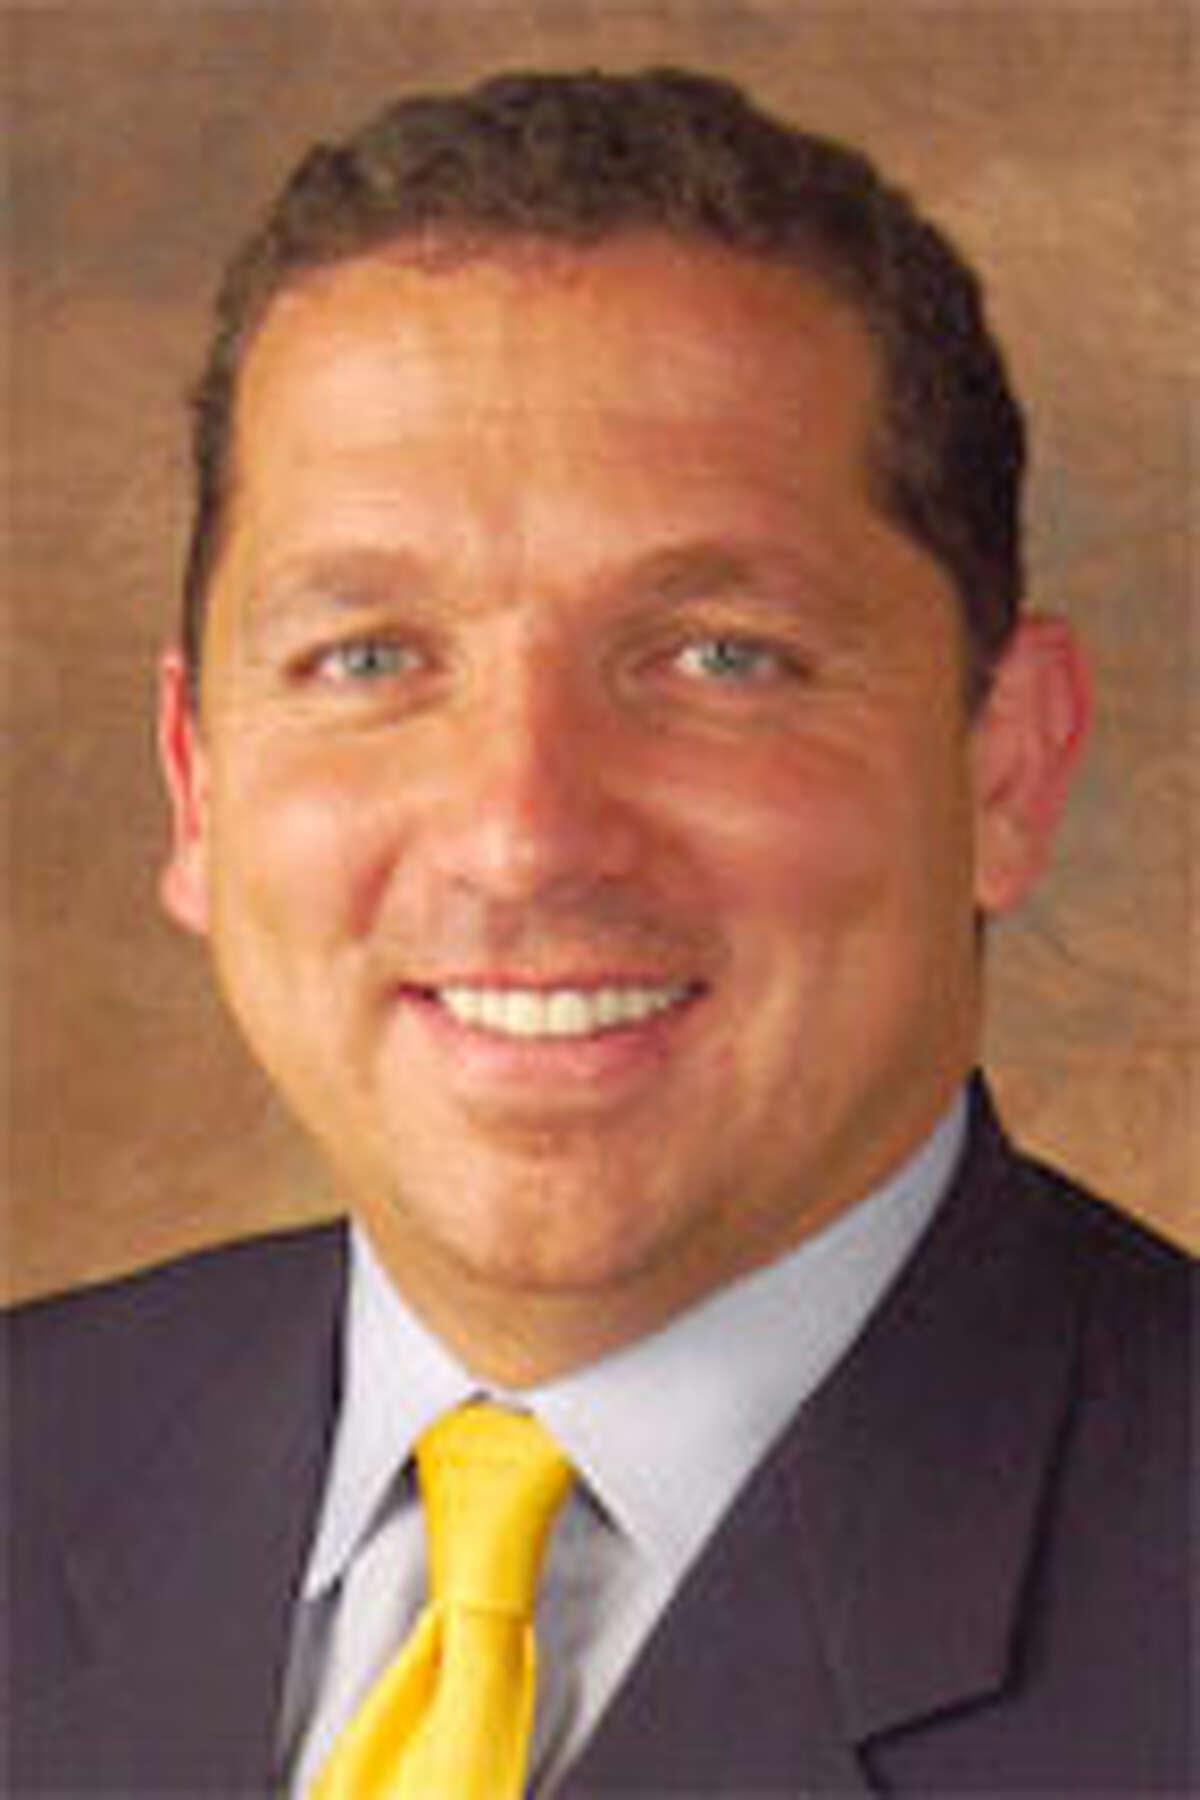 Tony Buzbee accused Harris County District Attorney Kim Ogg of